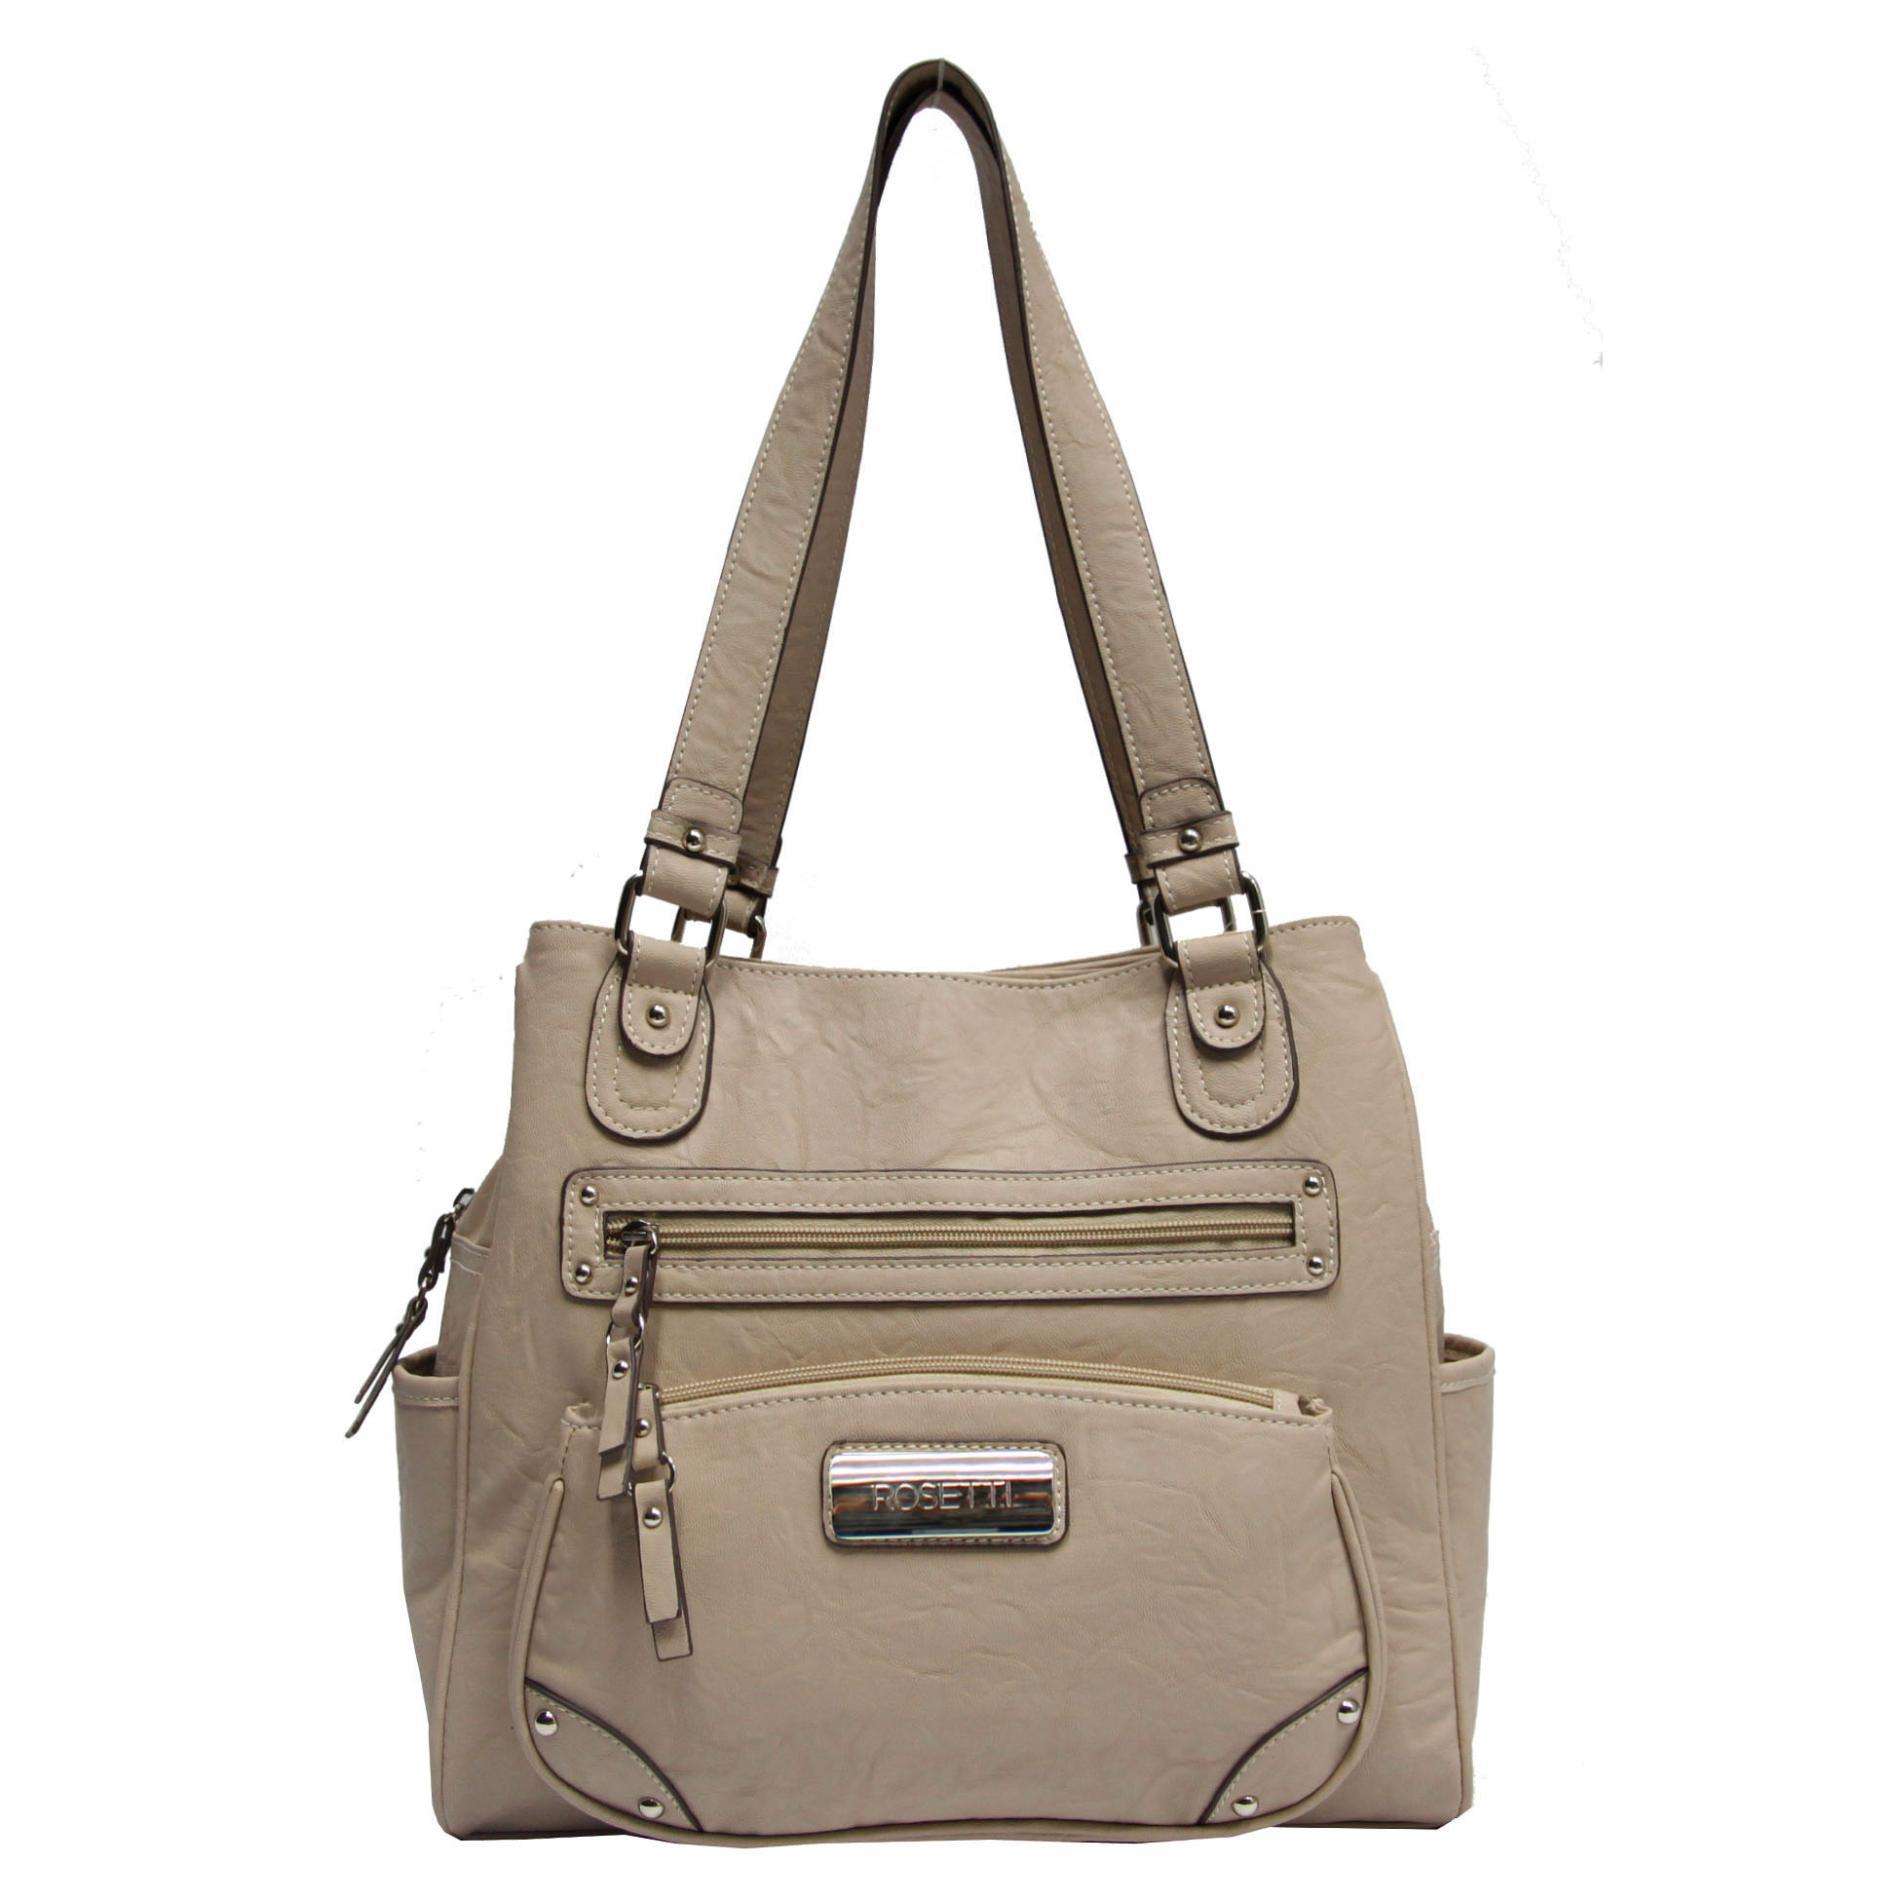 Rosetti Women's On the Brink Shopper Handbag